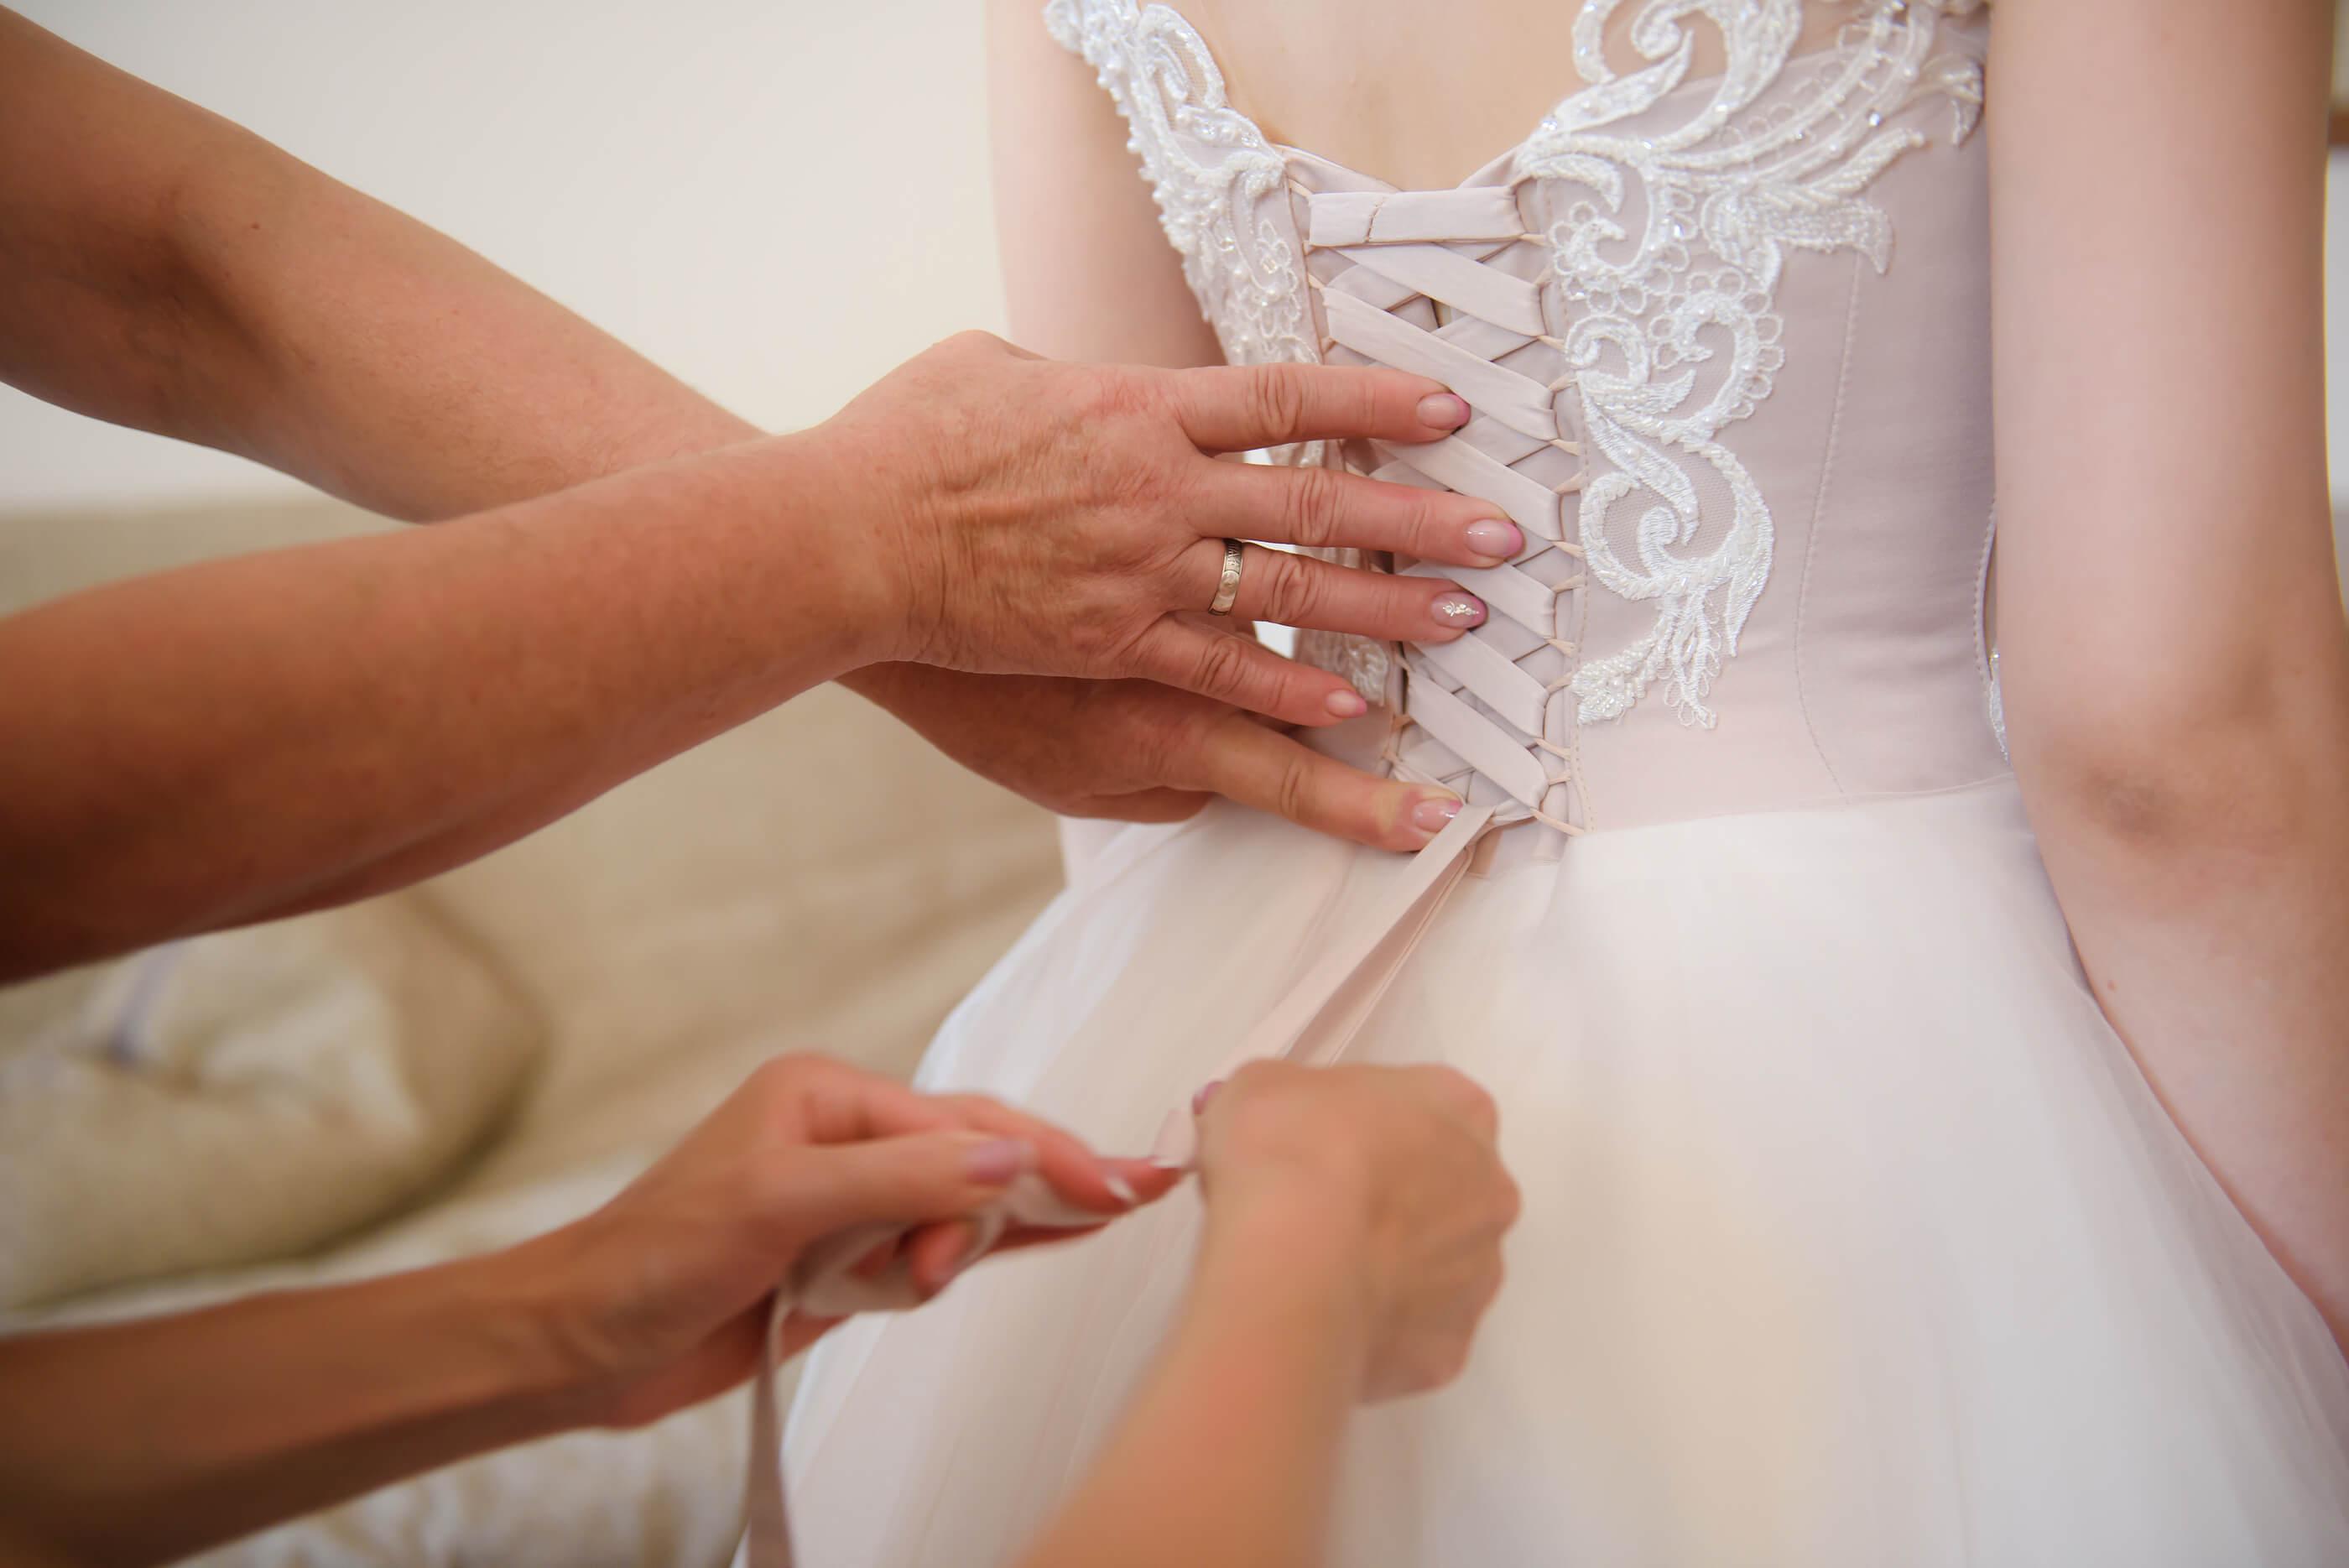 WEDDING DRESS TOO SMALL?